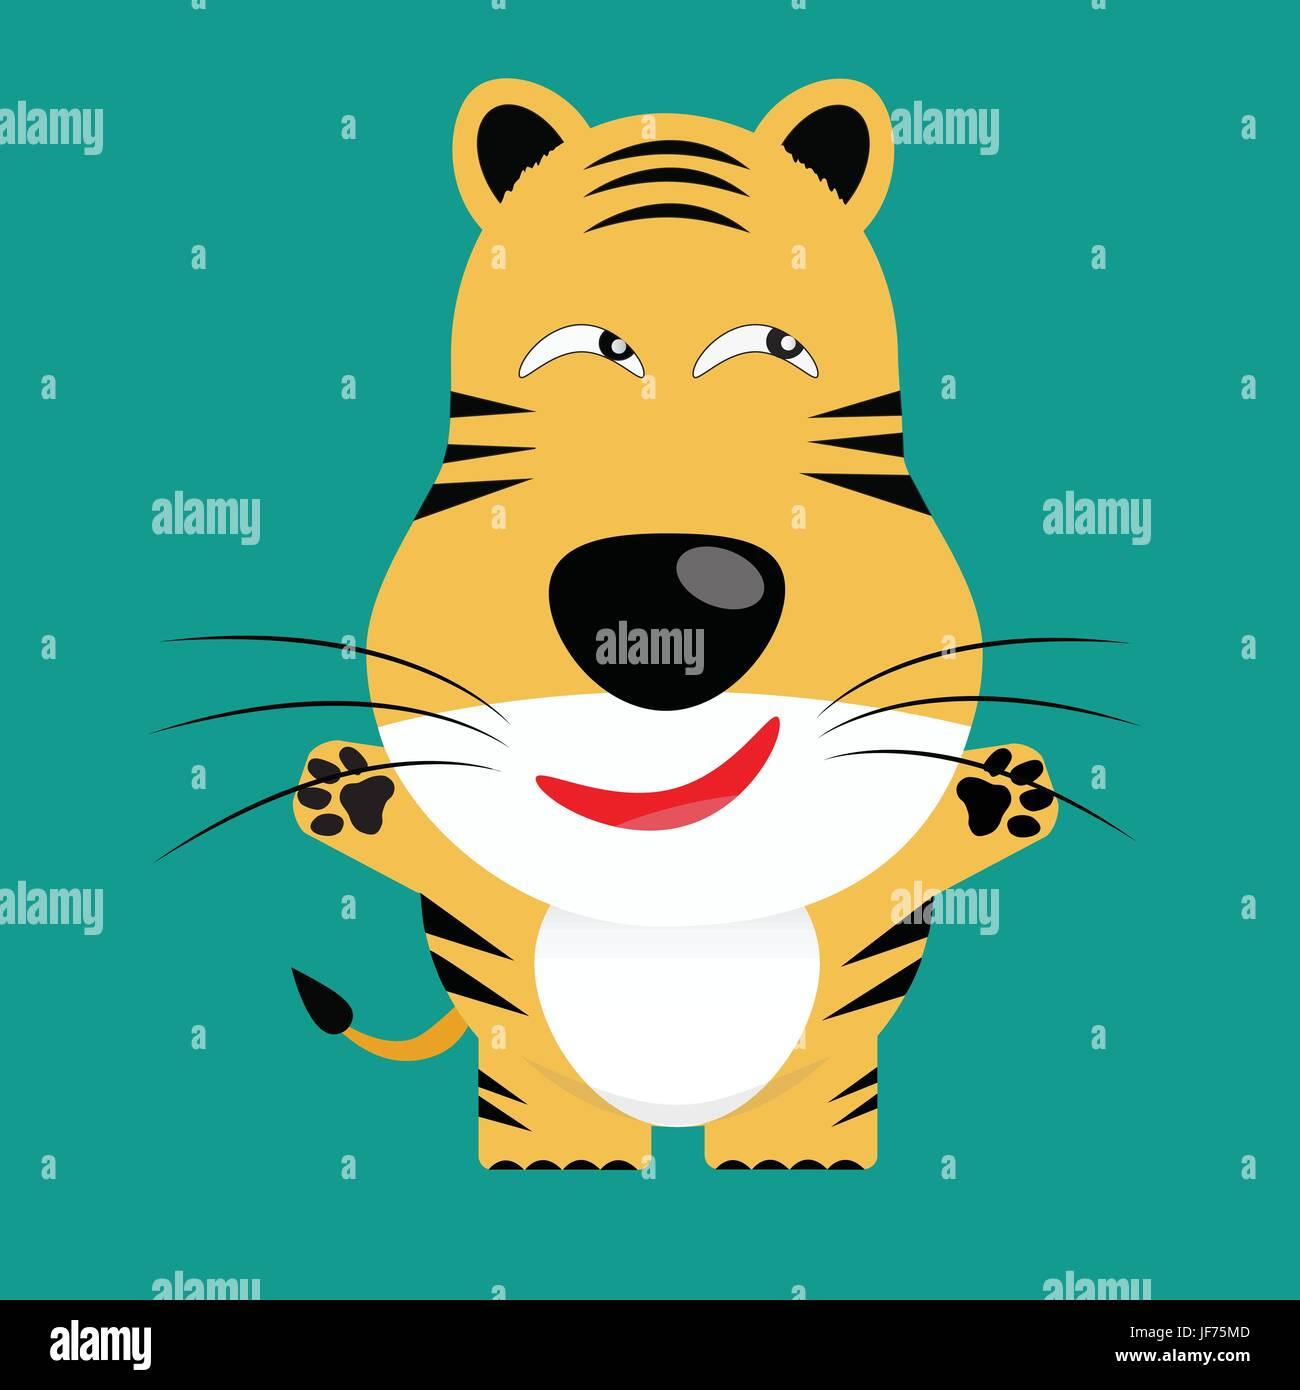 art, isolated, graphic, animal, wild, big cat, feline predator, cat, tiger, - Stock Image